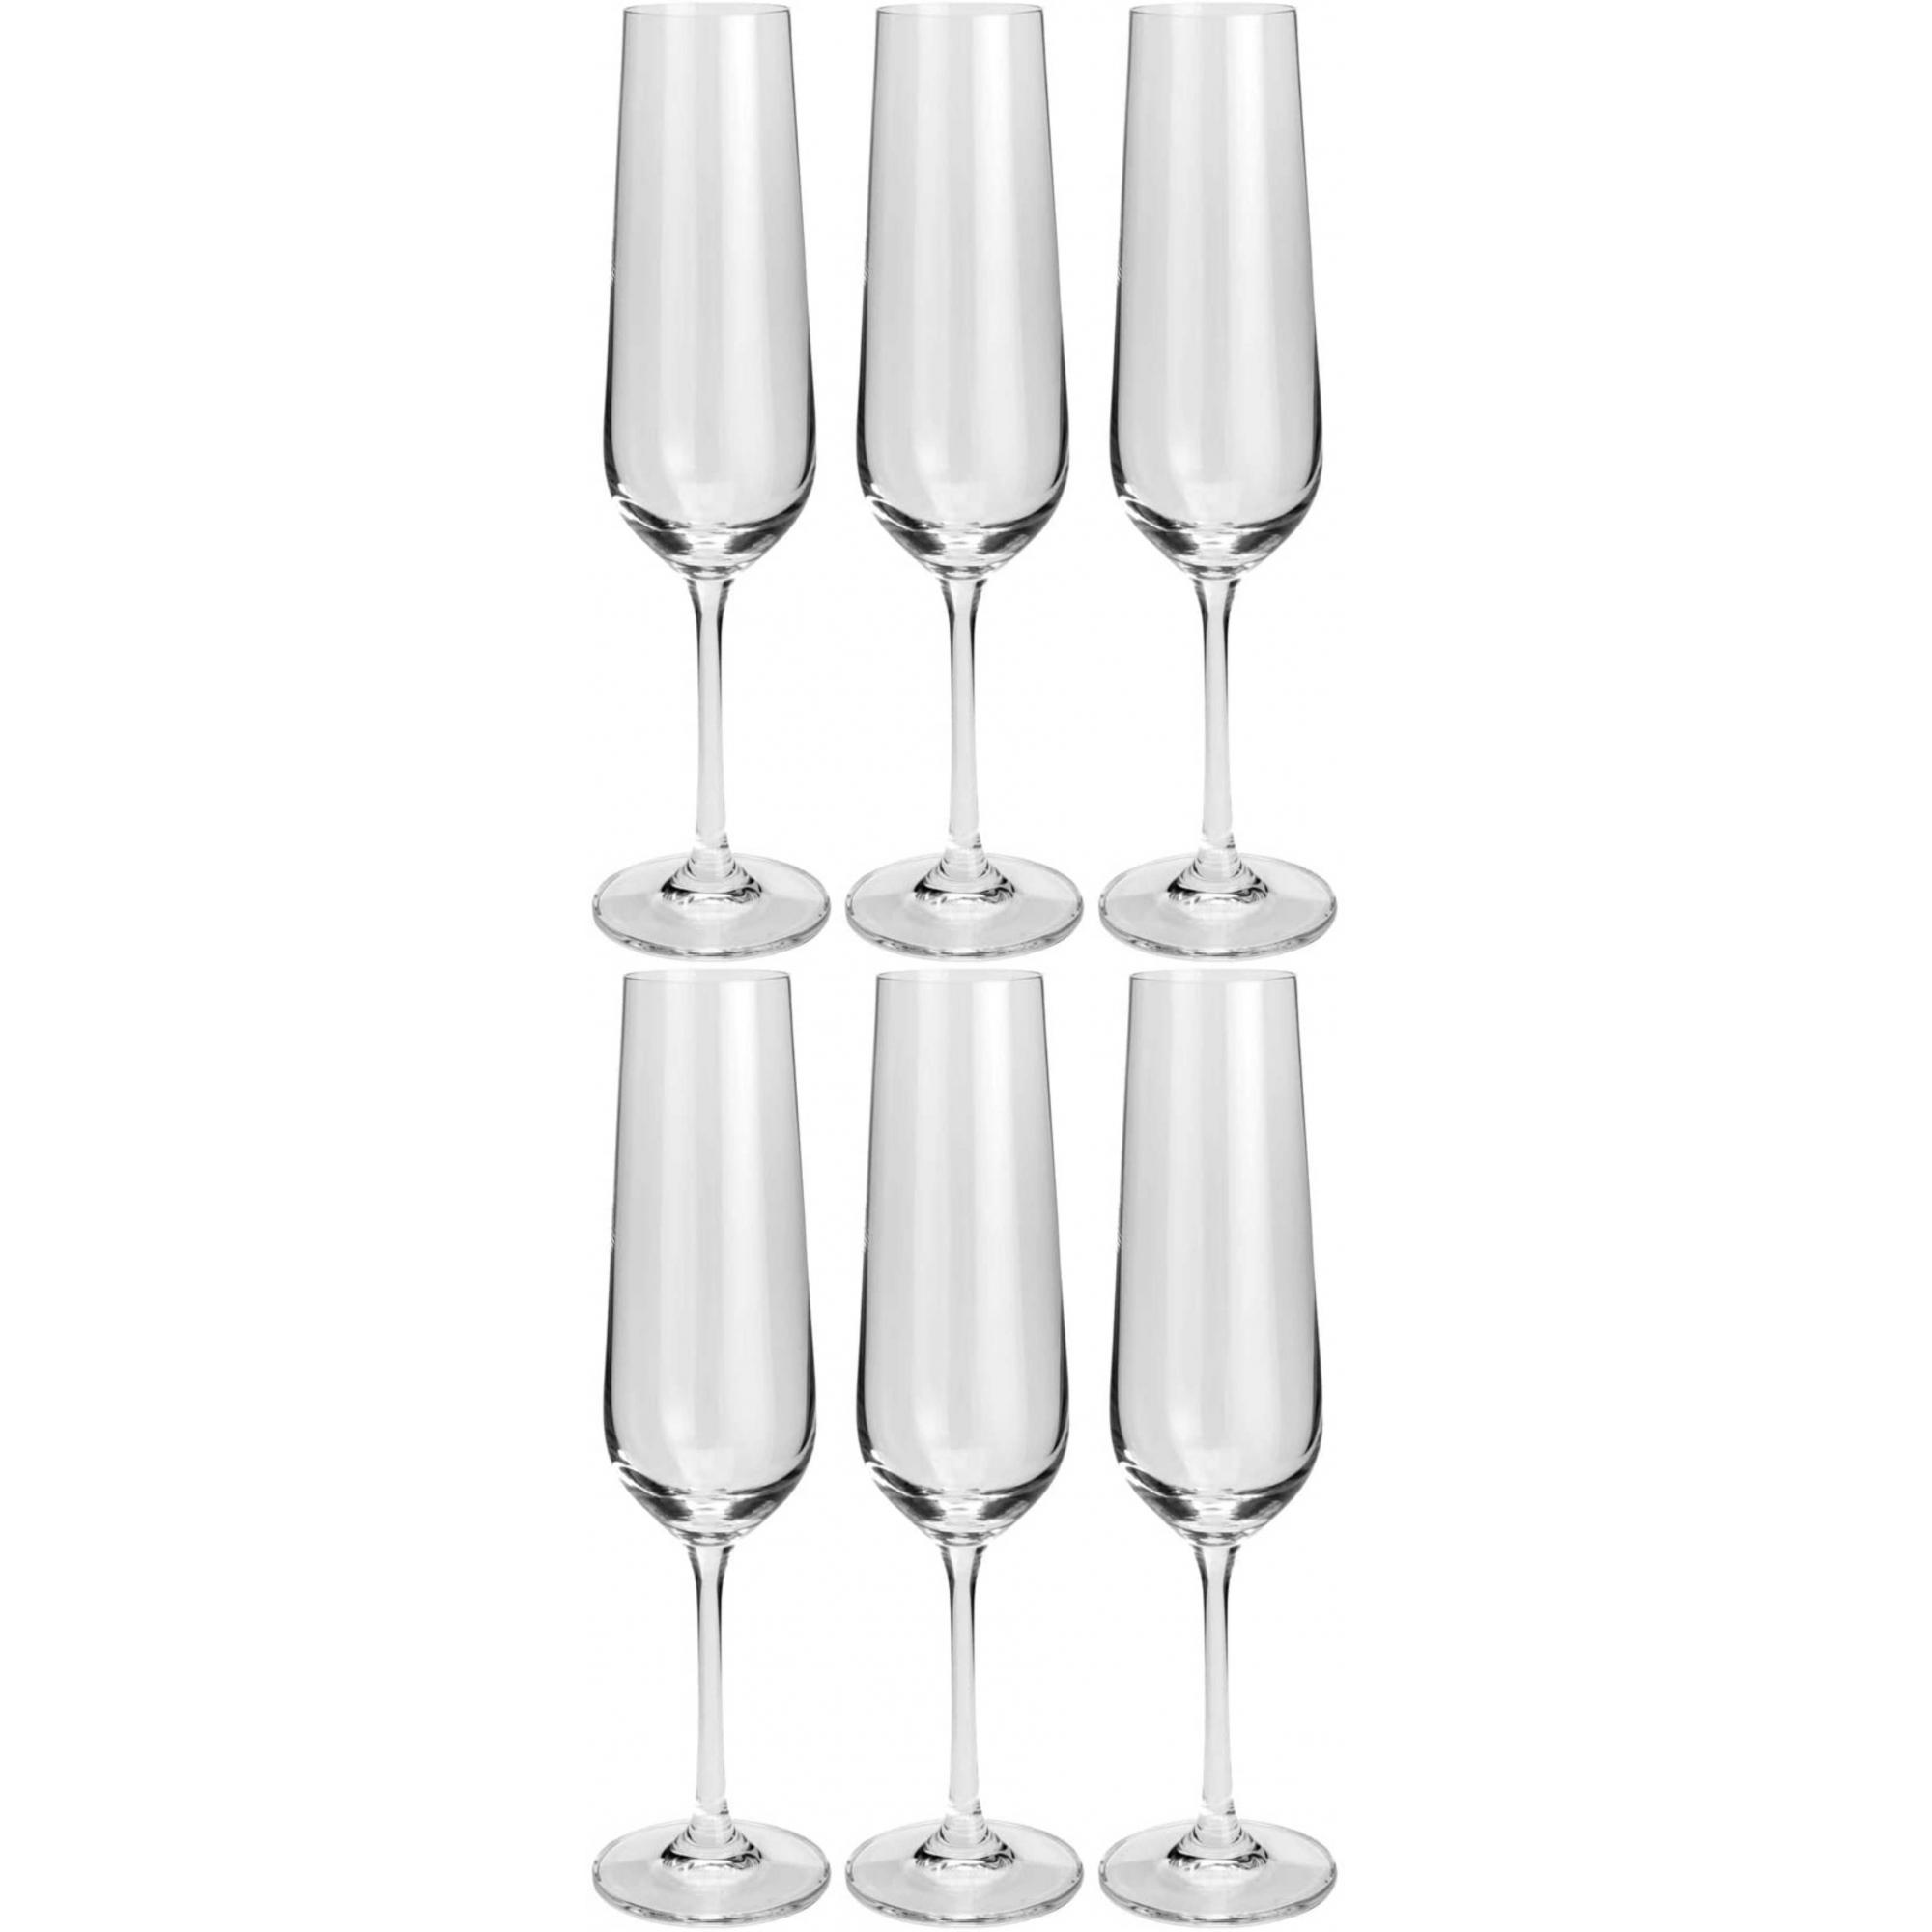 Conjunto 6 Taças Para Champagne de Cristal Ecológico Strix 200ml - Bohemia